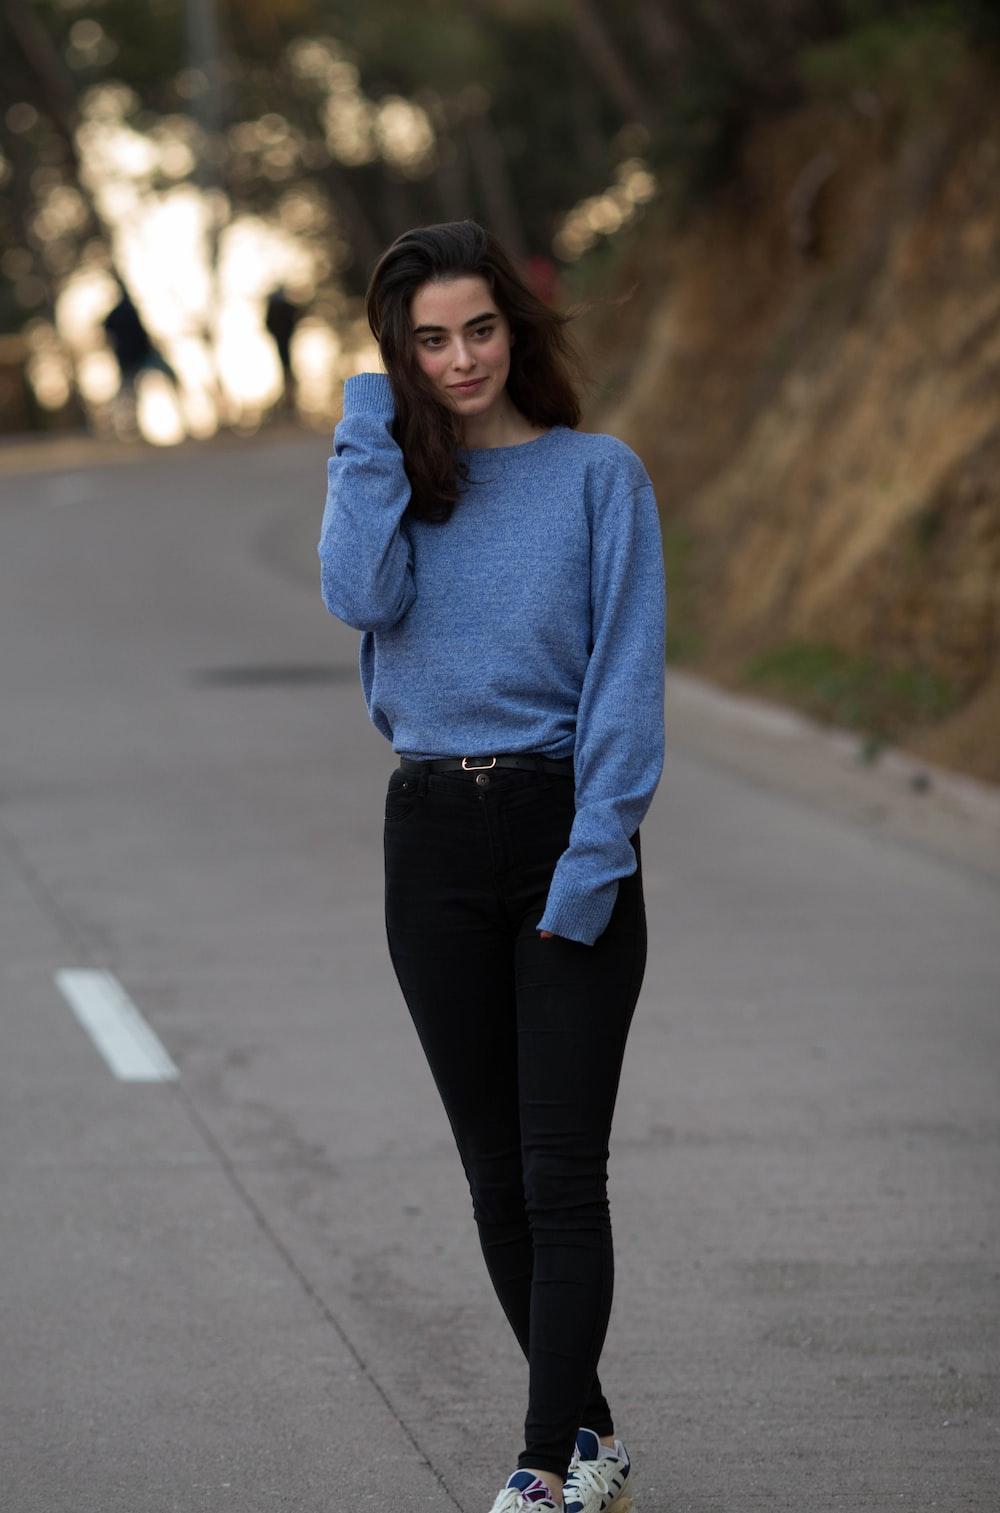 woman wearing blue sweatshirt and black straight-cut jeans \